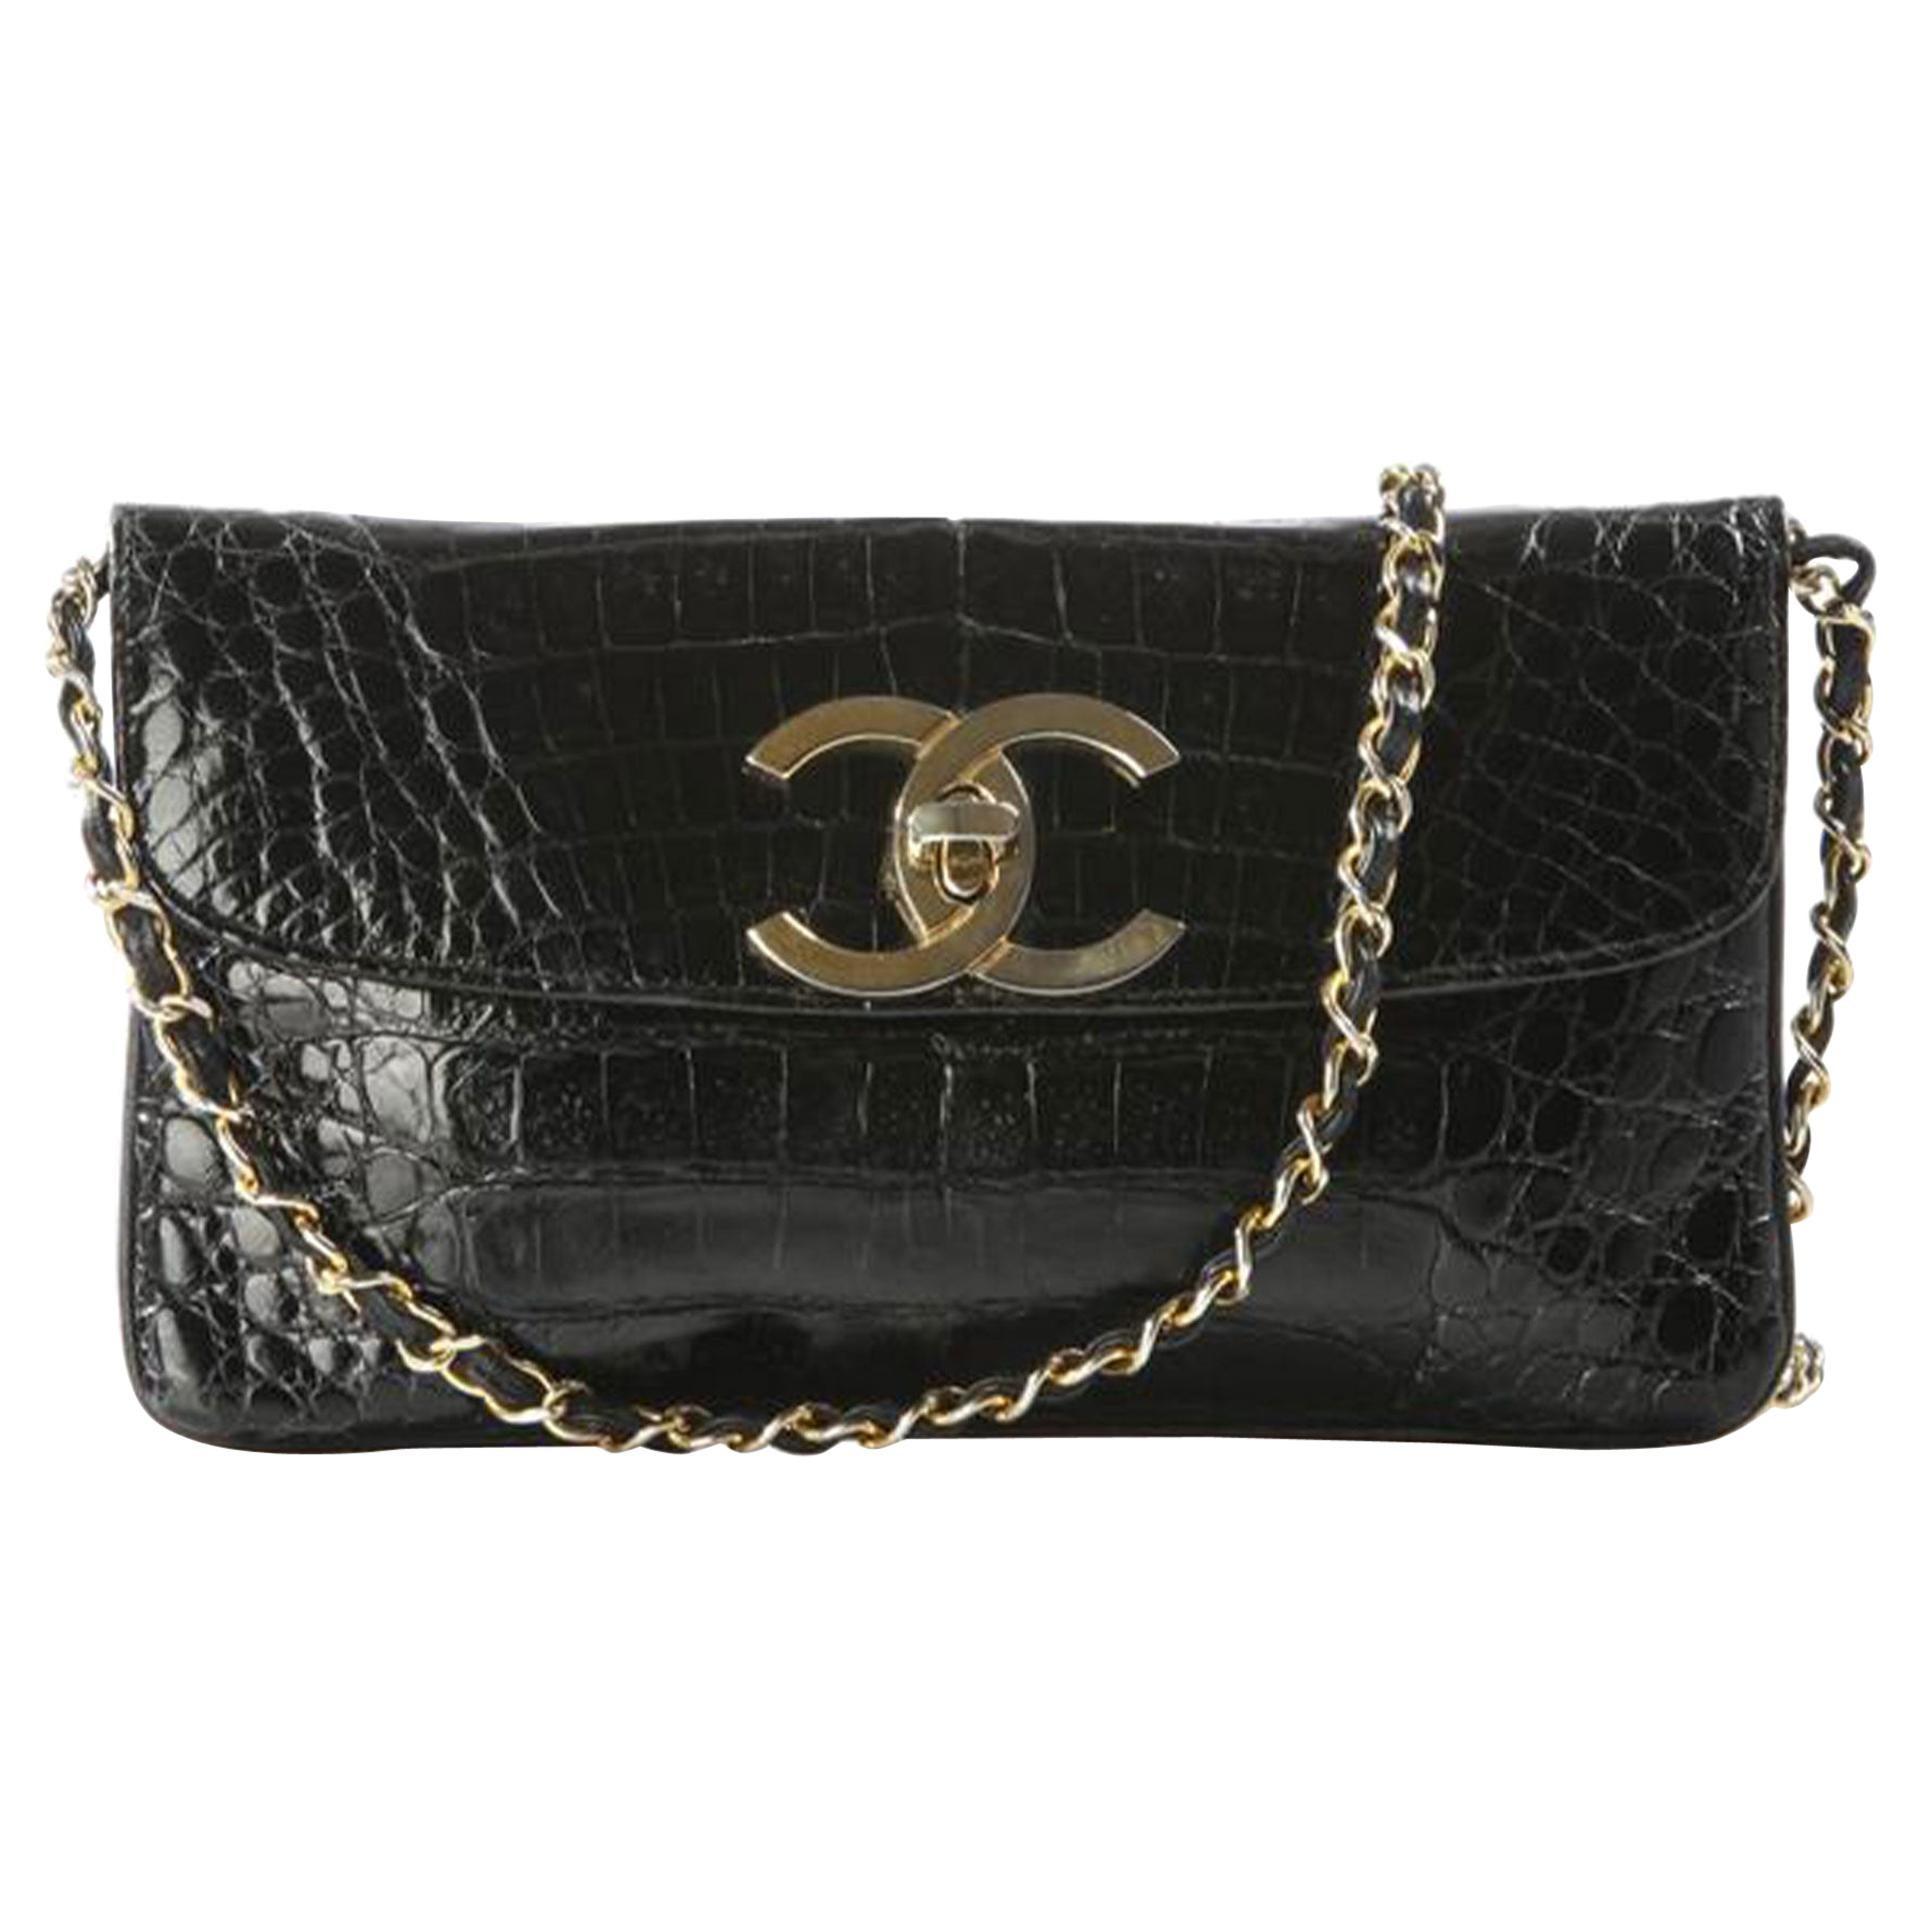 Chanel Classic Flap Giant CC Shiny Vintage Rare Black Crocodile Skin Leather Bag